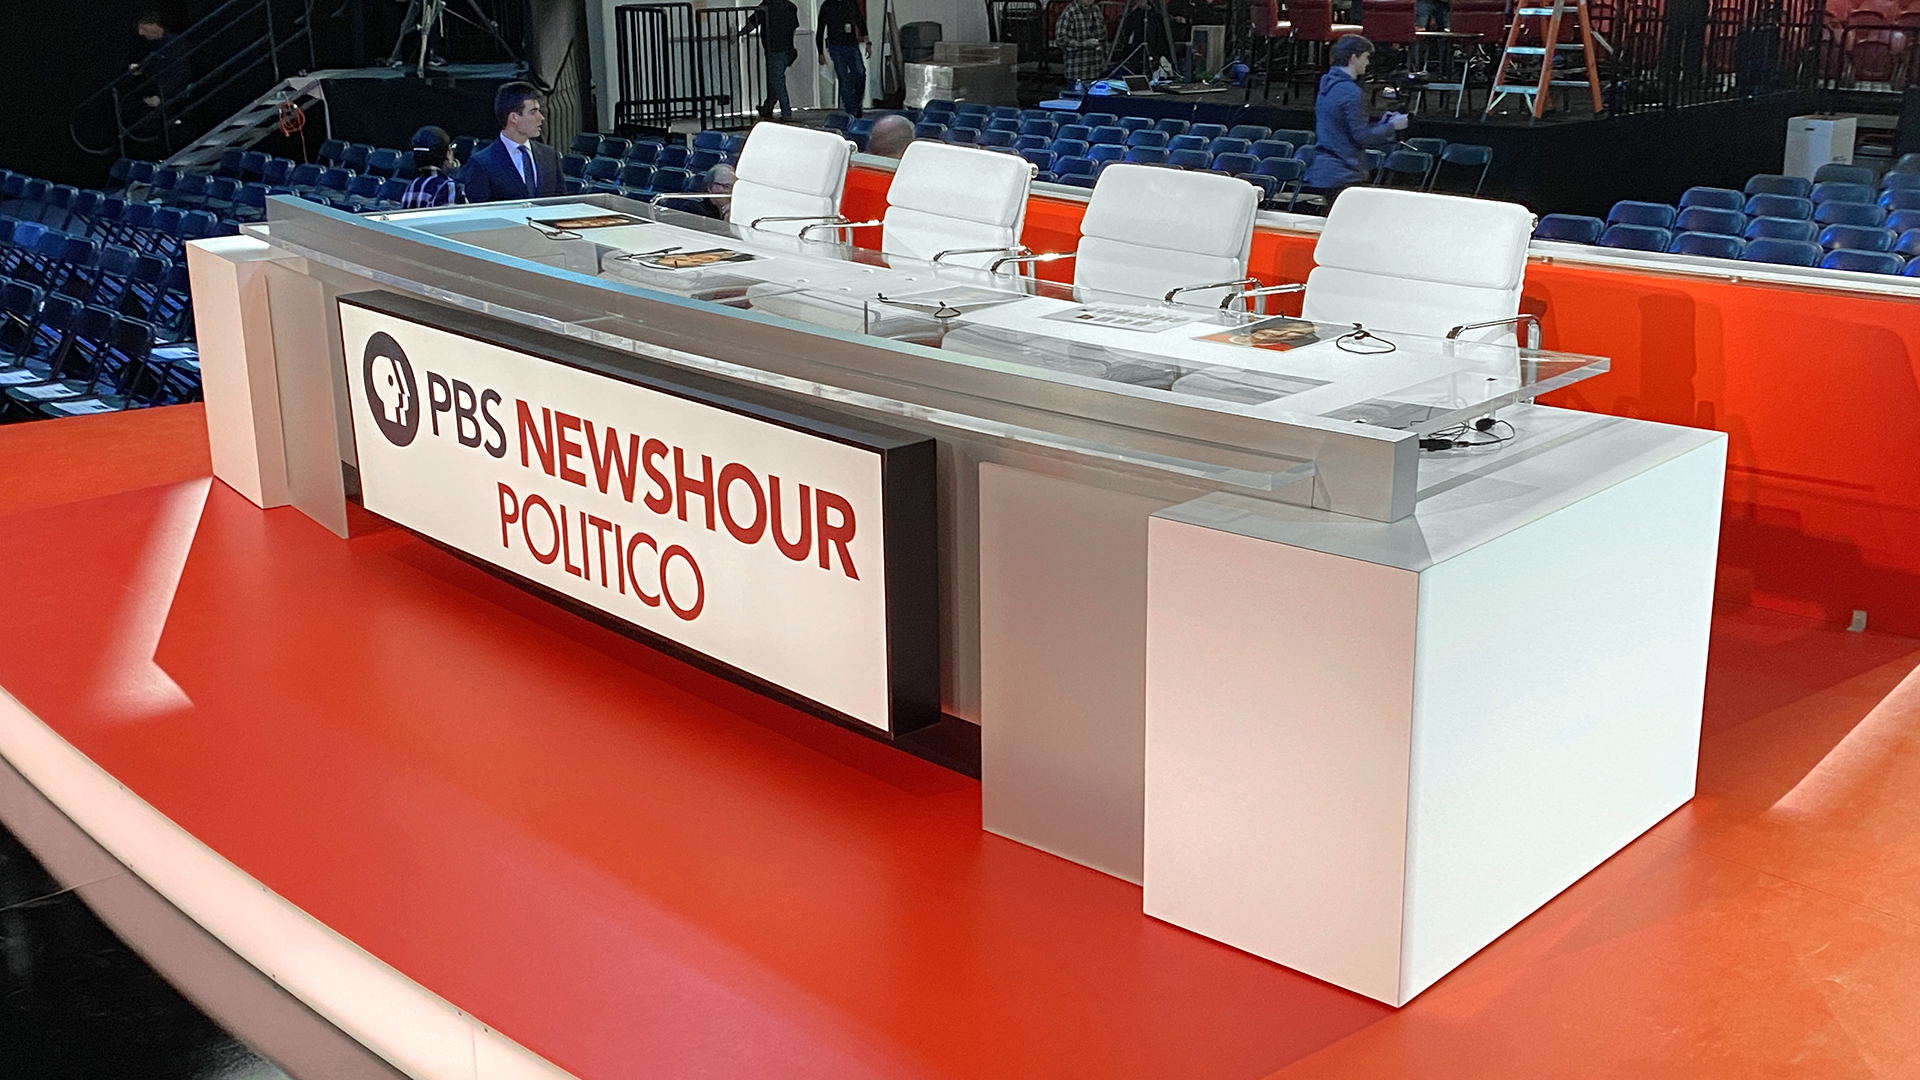 NCS_PBS-NewsHour_Politico_Democratic-Debate_014